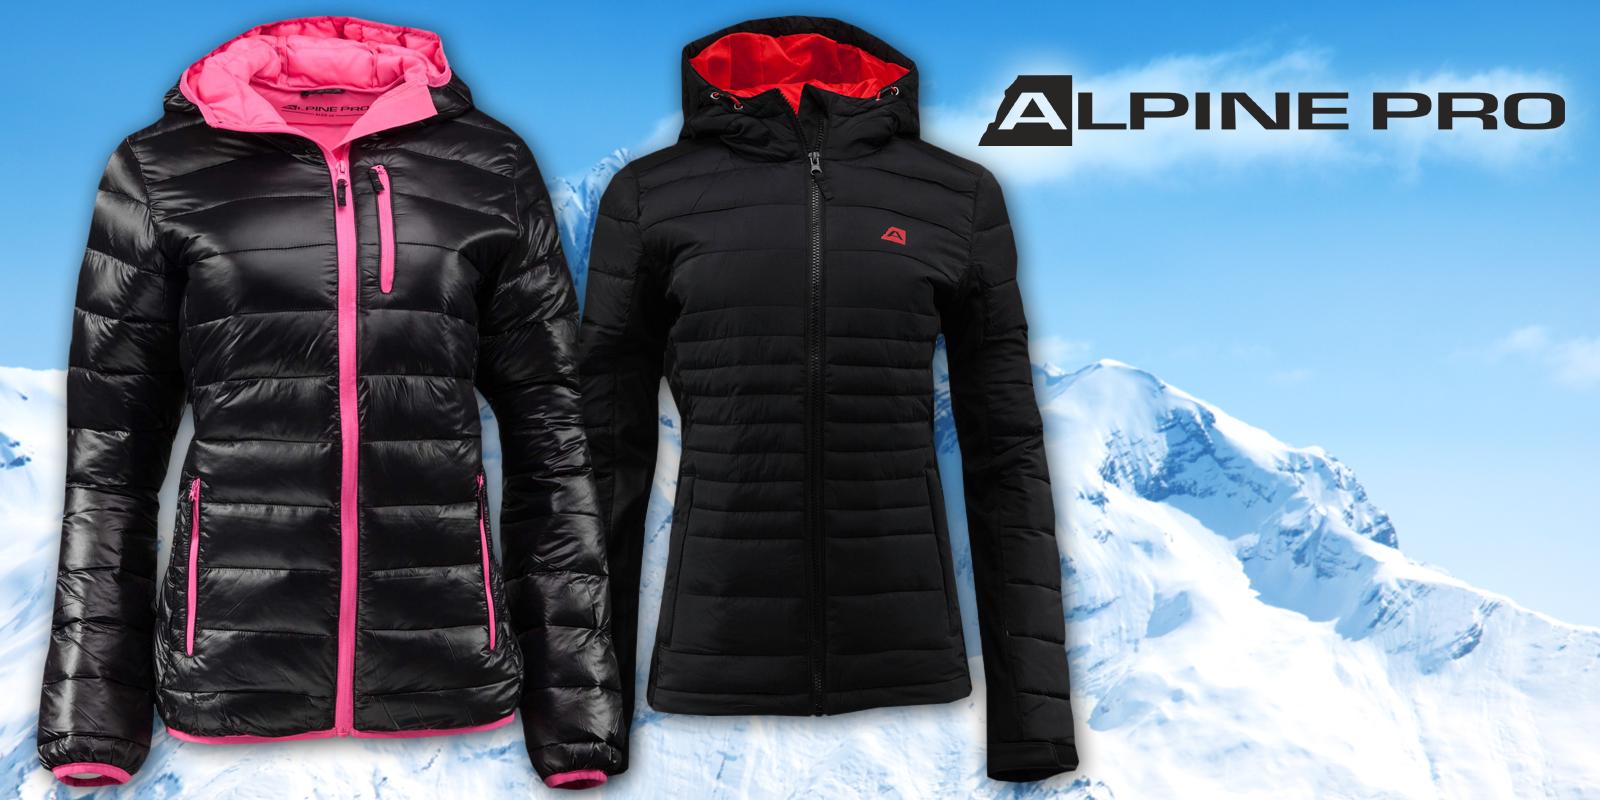 134fecac5 Buďte pripravené na zimu: dámske bundy Alpine Pro s impregnačnou vrstvou  DWR   Zlavomat.sk